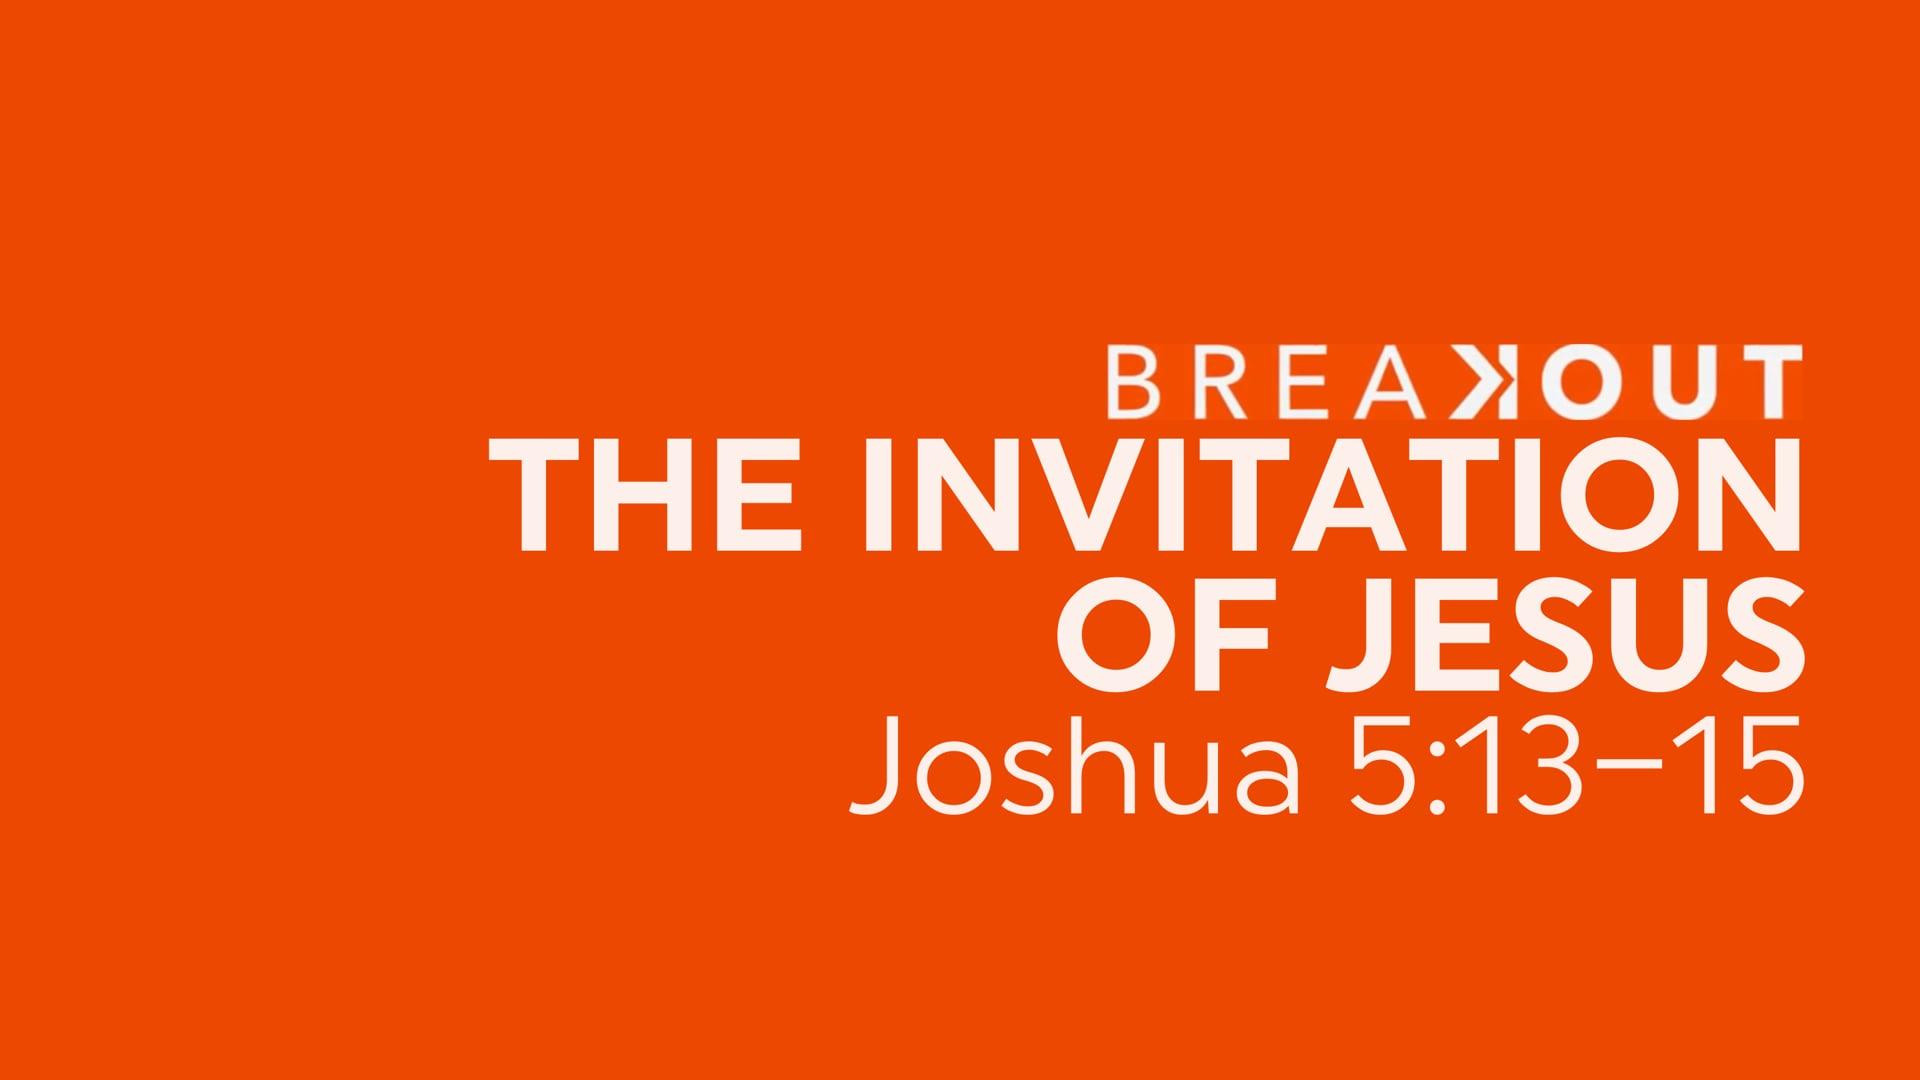 The Invitation of Jesus - January 31, 2021